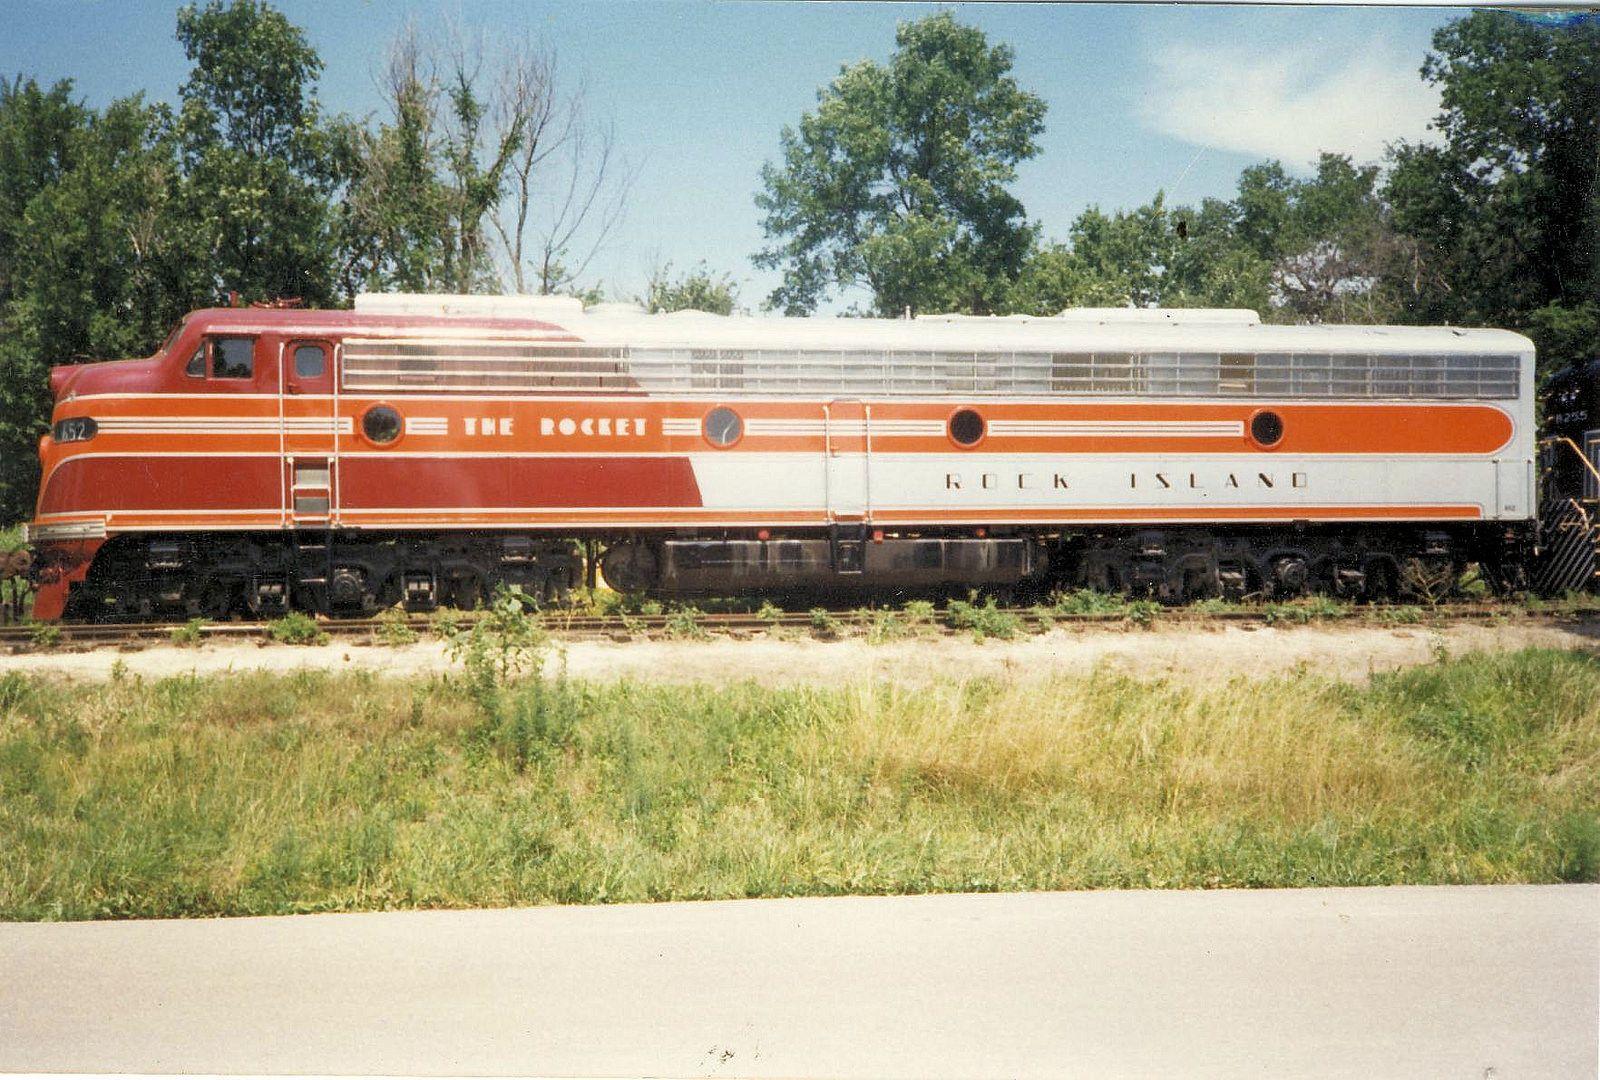 https://flic.kr/p/jA85Uo | EMD E-9 locomotive Rock Island Rocket Baldwin, KS.